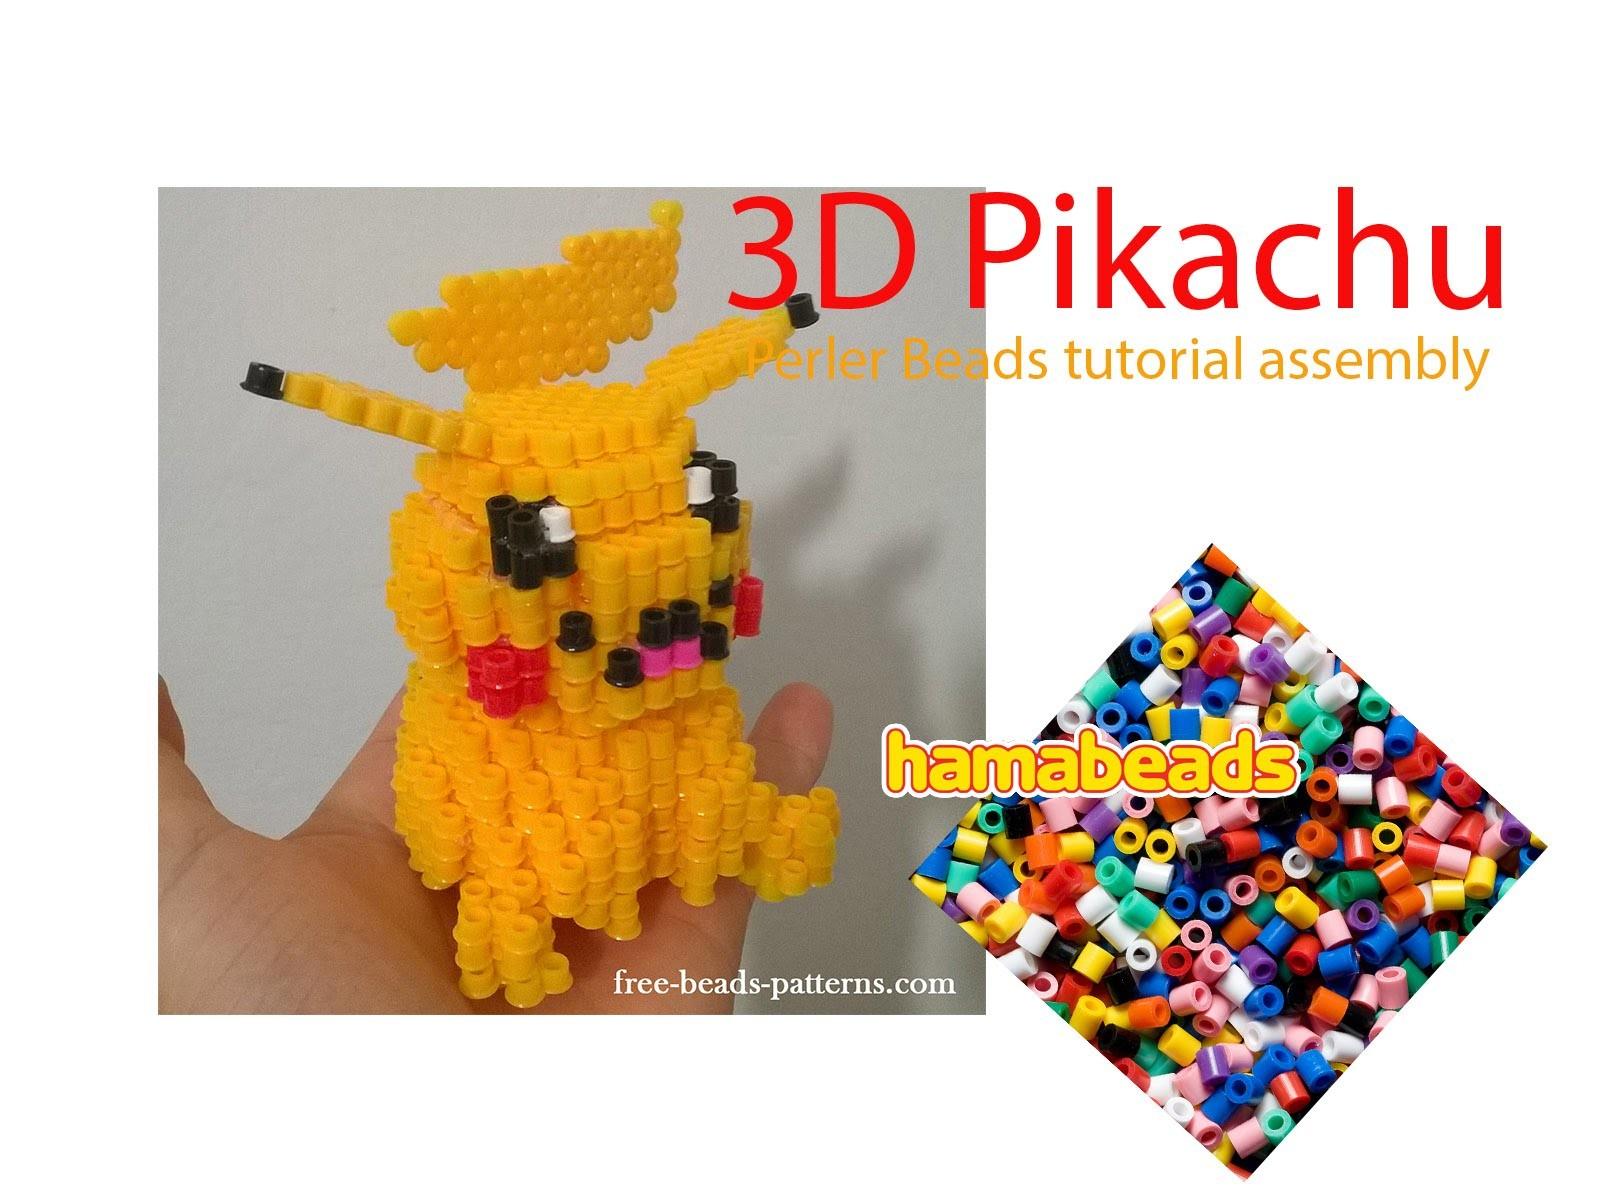 3d Pikachu Pokemon Perler Beads Hama Beads Tutorial Assembly